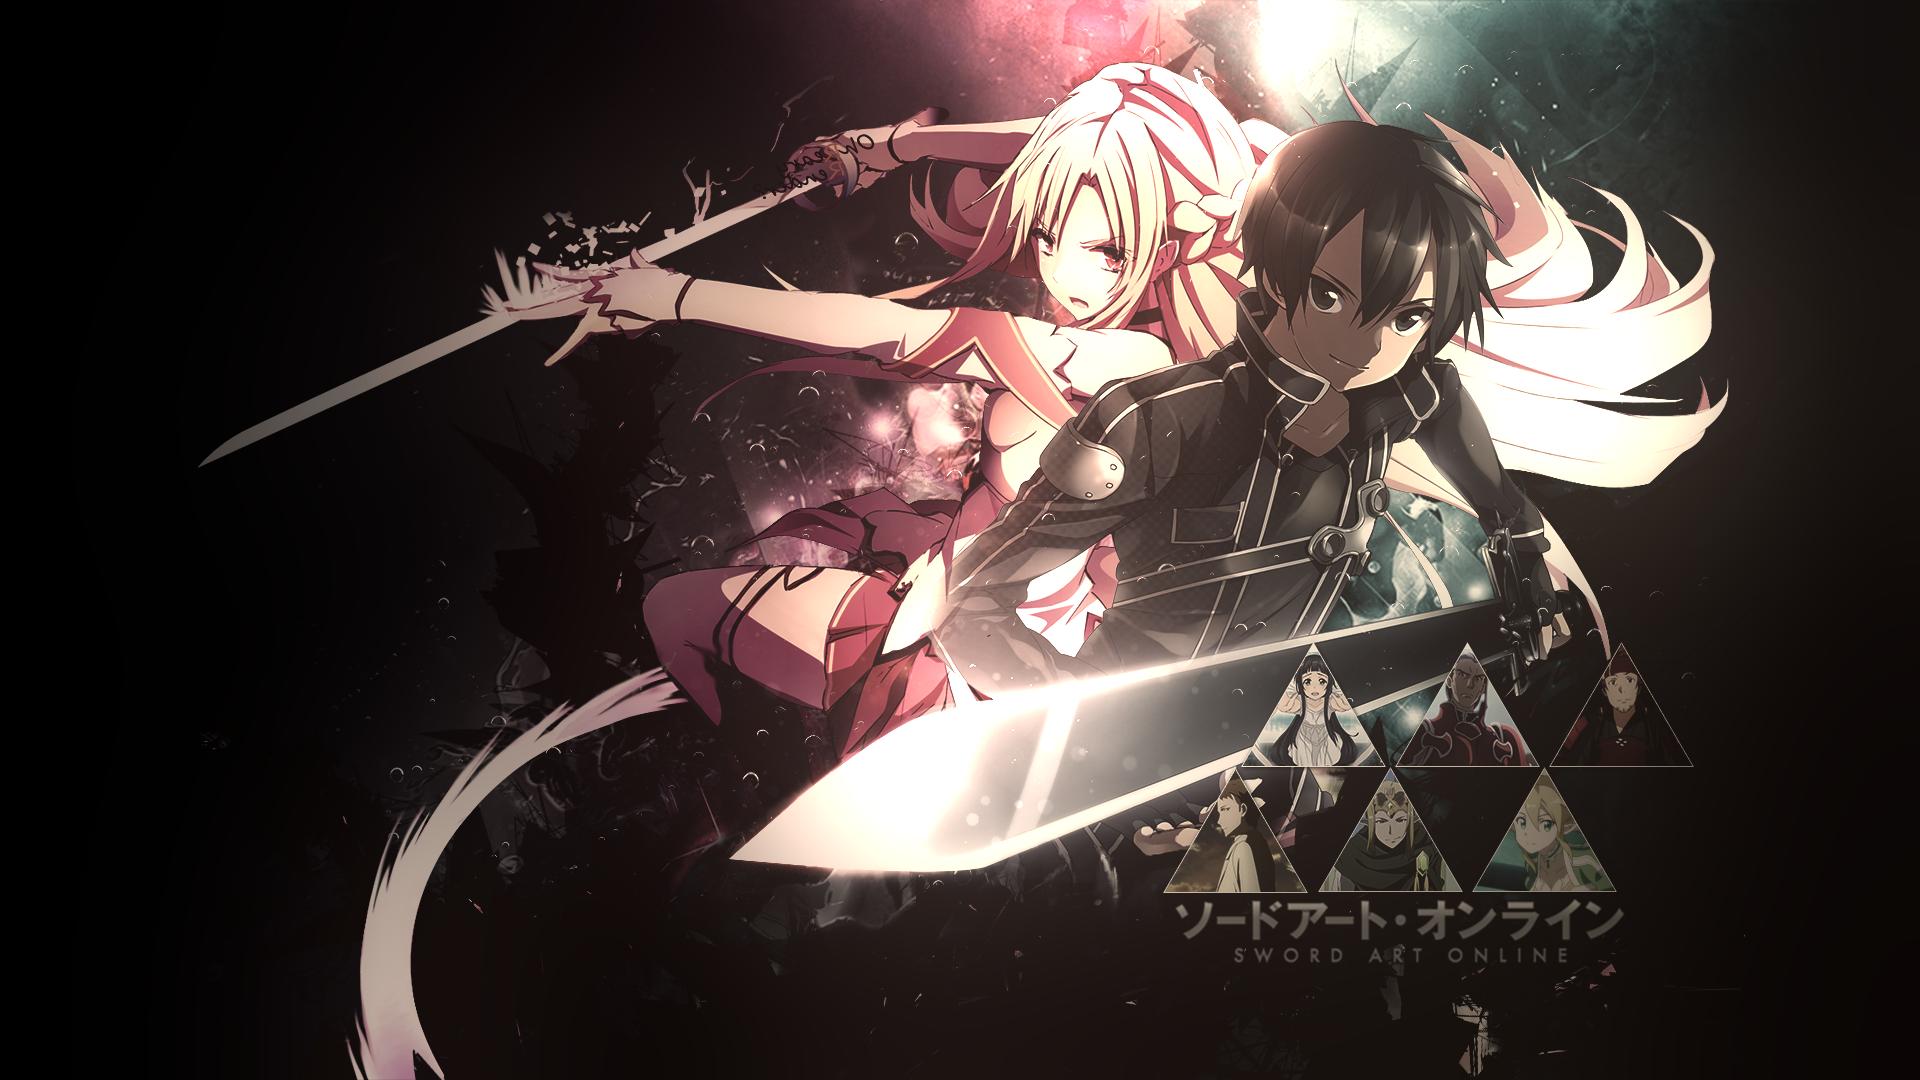 Kirito x Asuna always fight aside eachother Sword Art